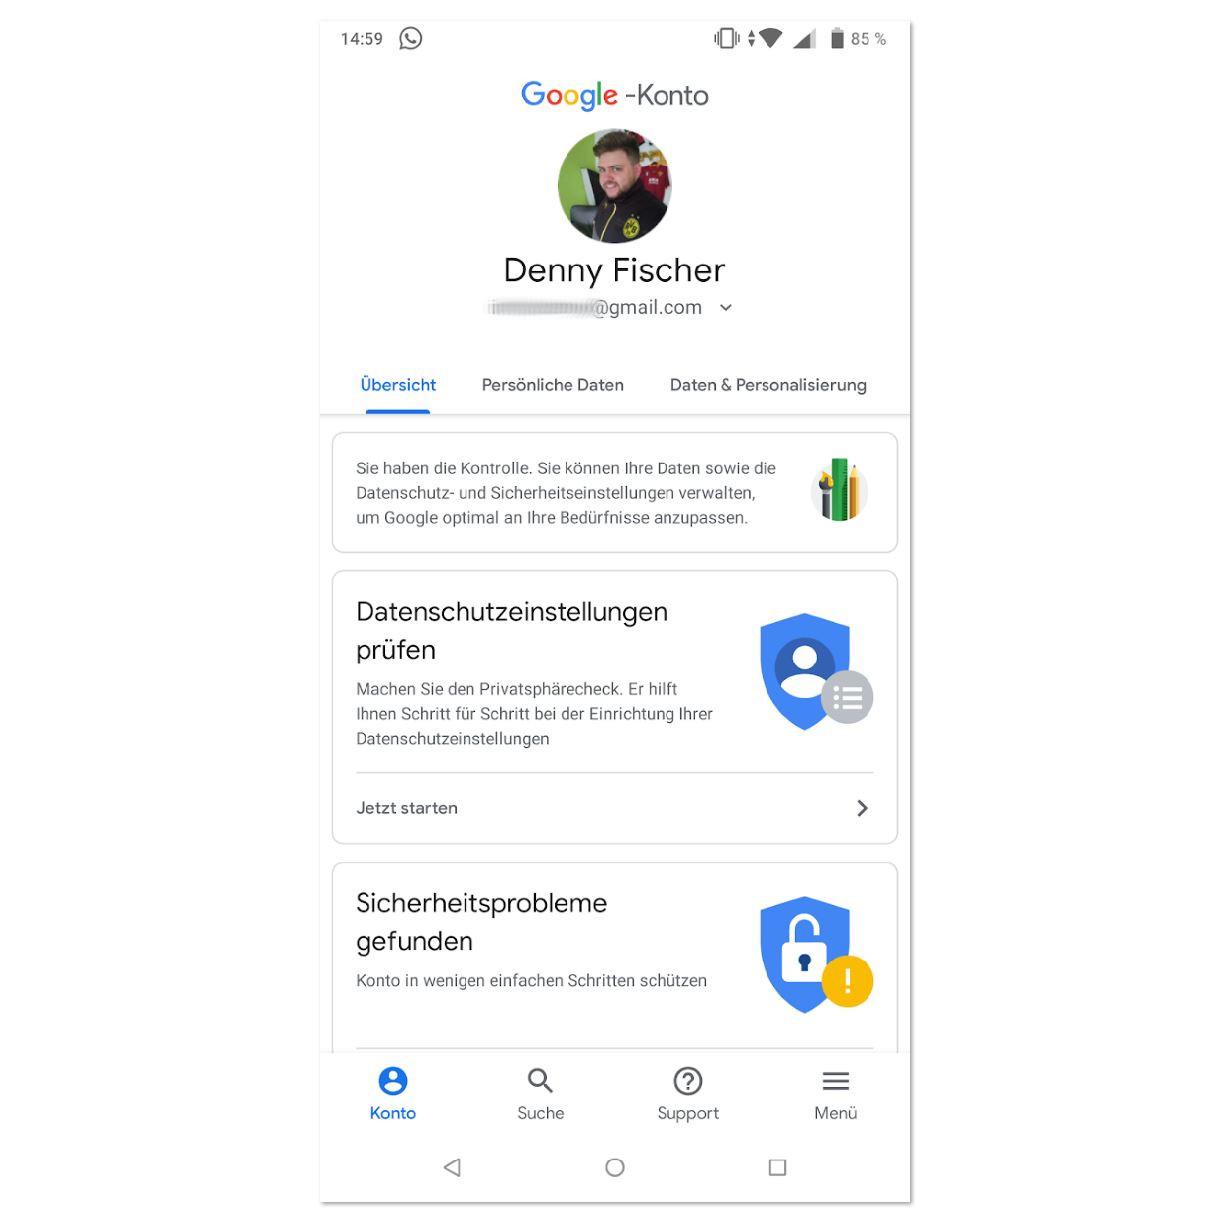 Google-Konto Update Juni 2018 (2)